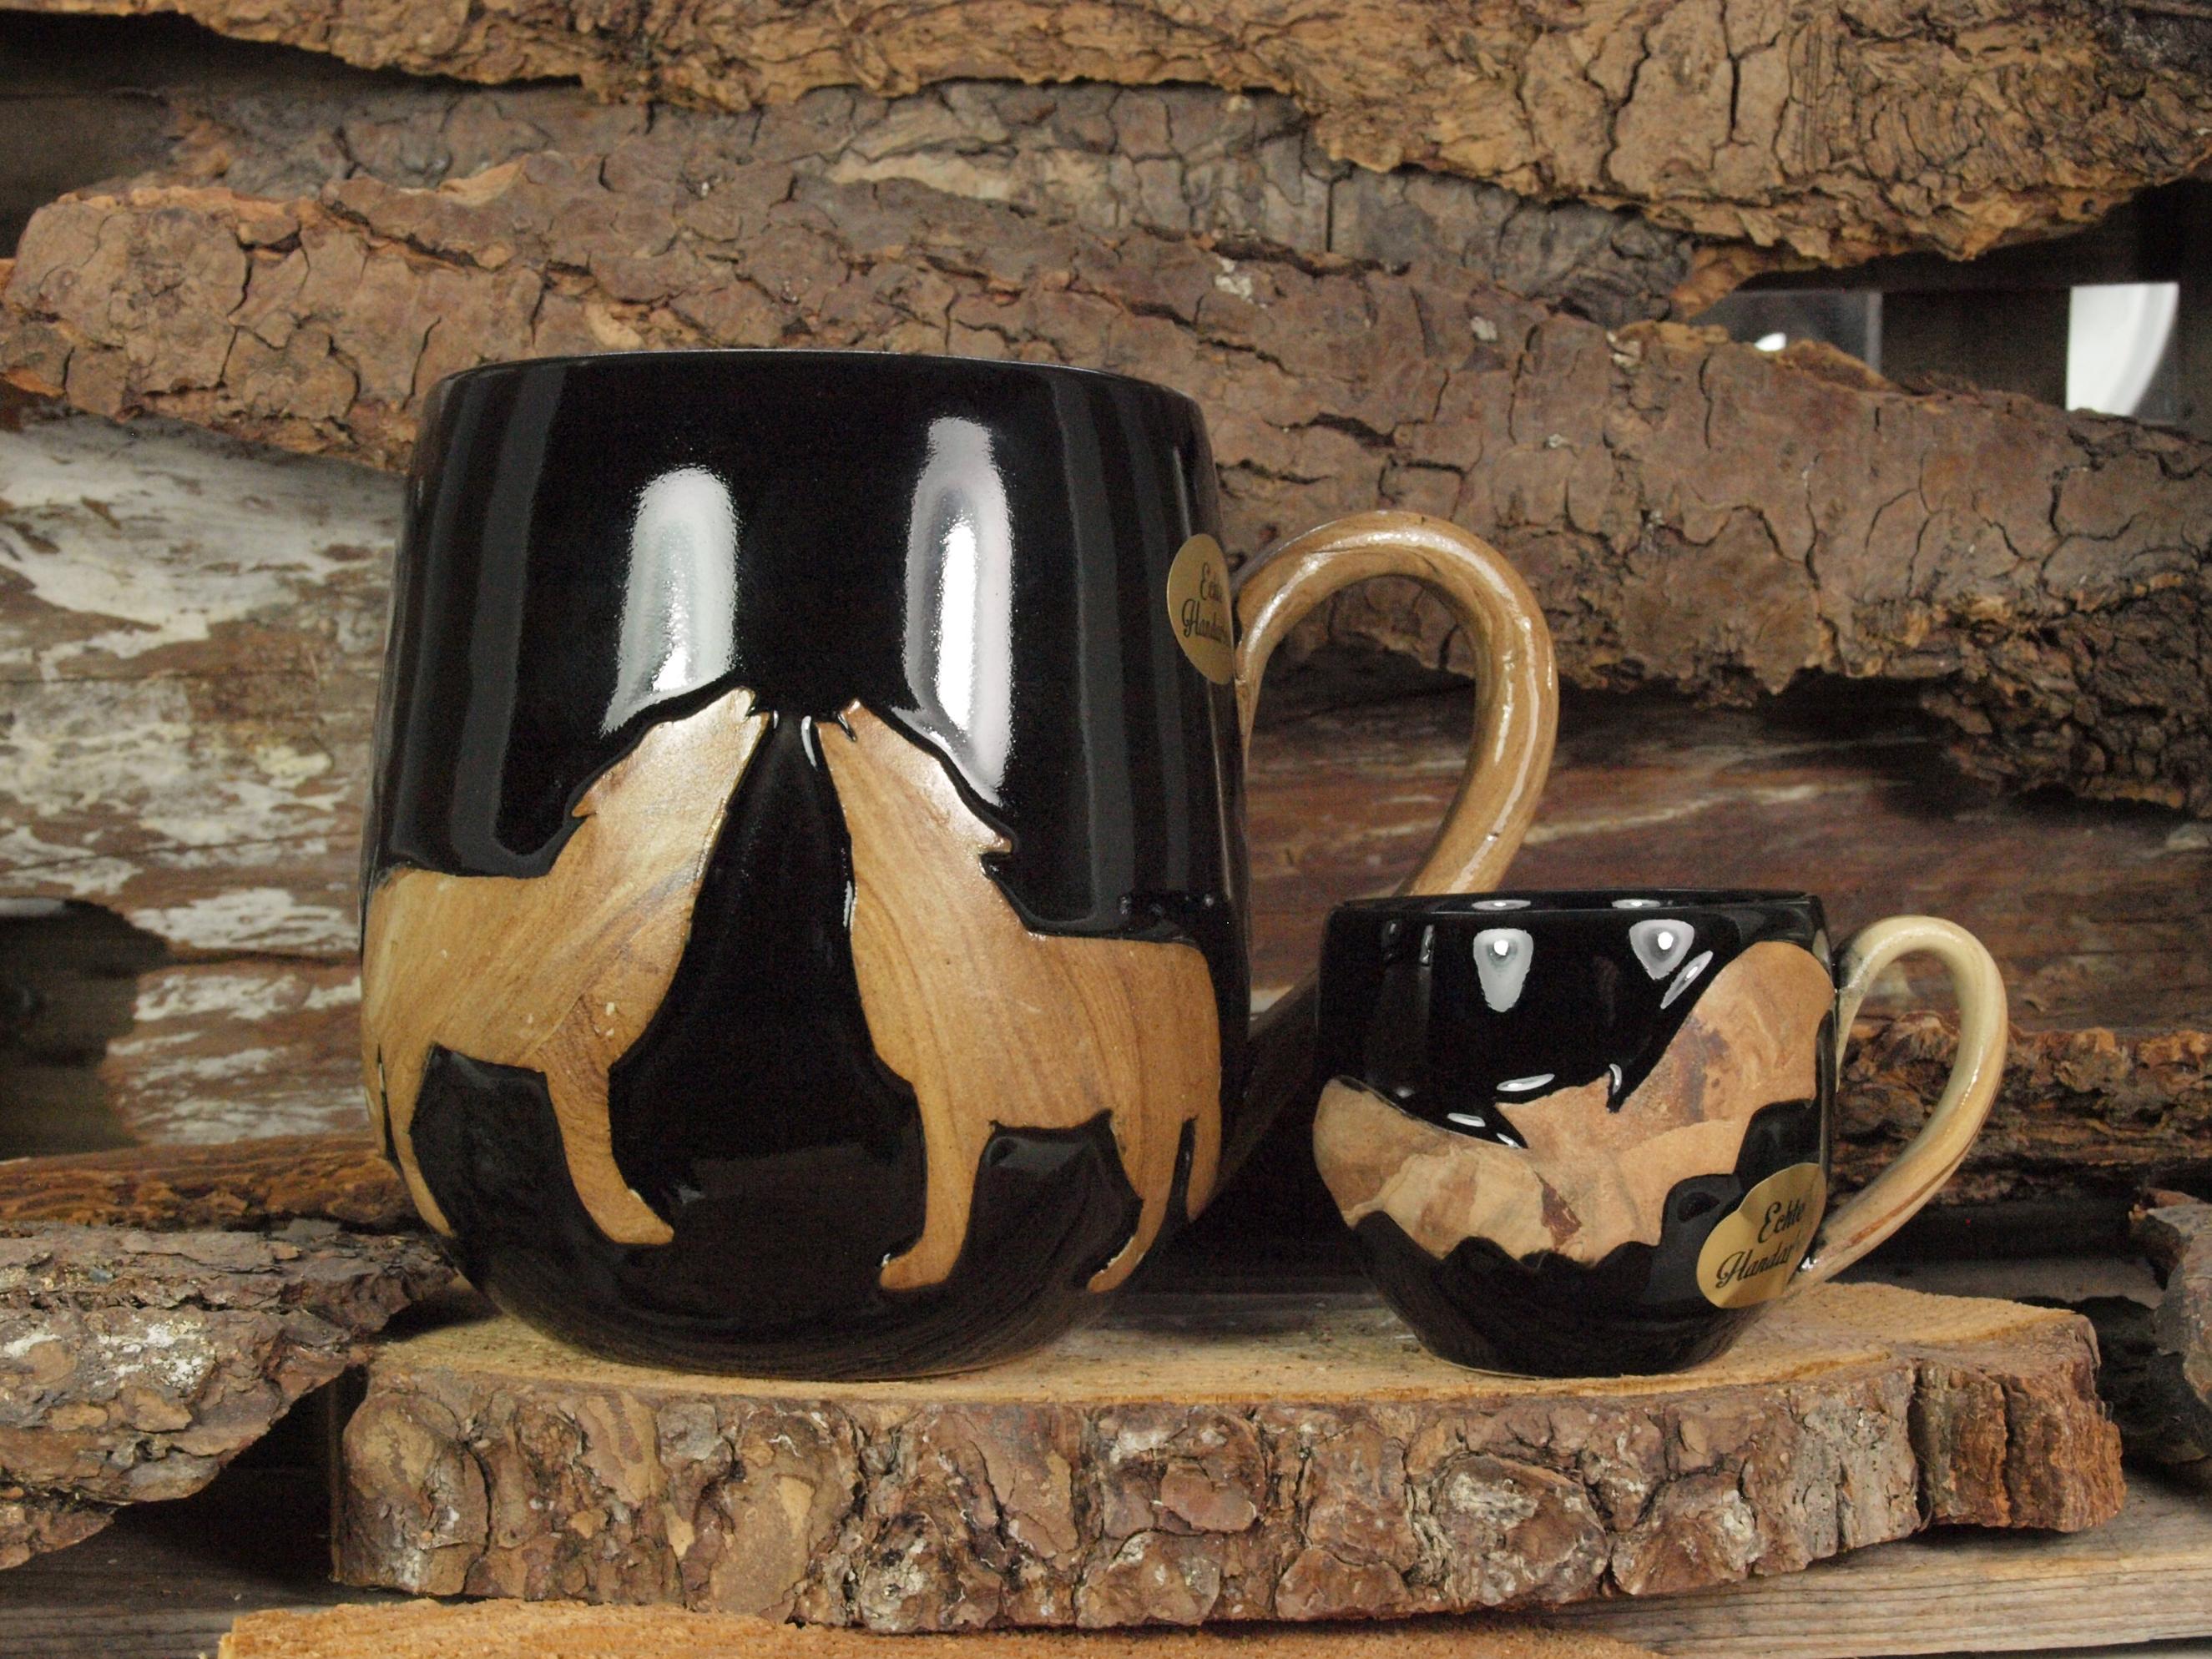 Harz Keramik - Jumbotasse und Espressotasse